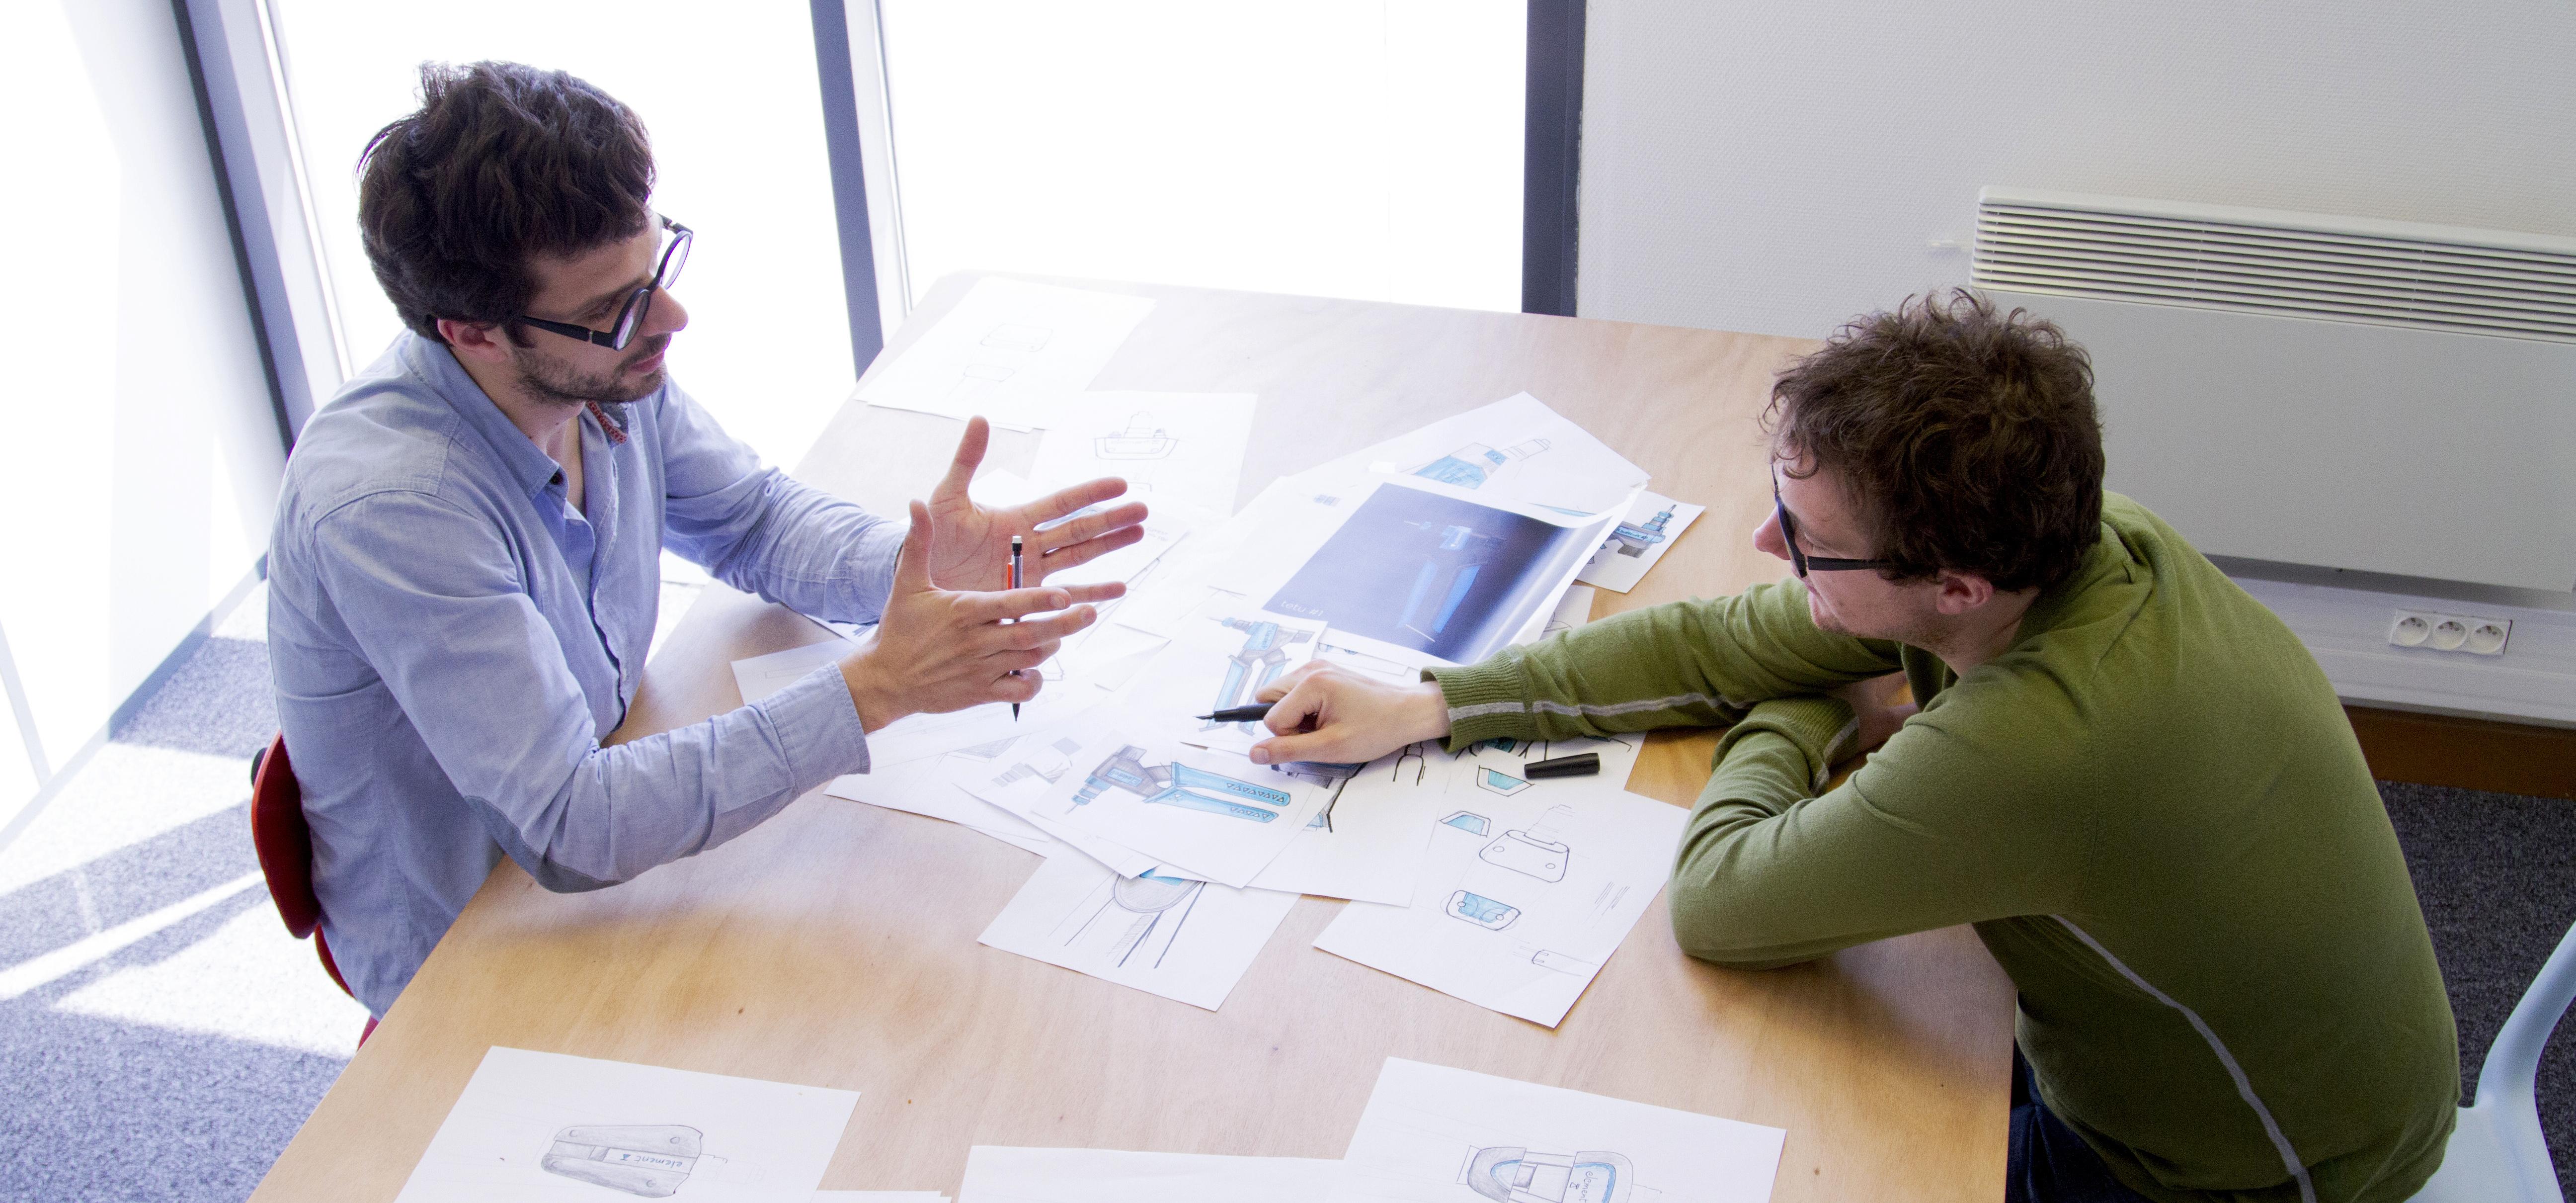 unistudio_scell-it_optee_pince-a-cheville_ergonomie_design_créativité